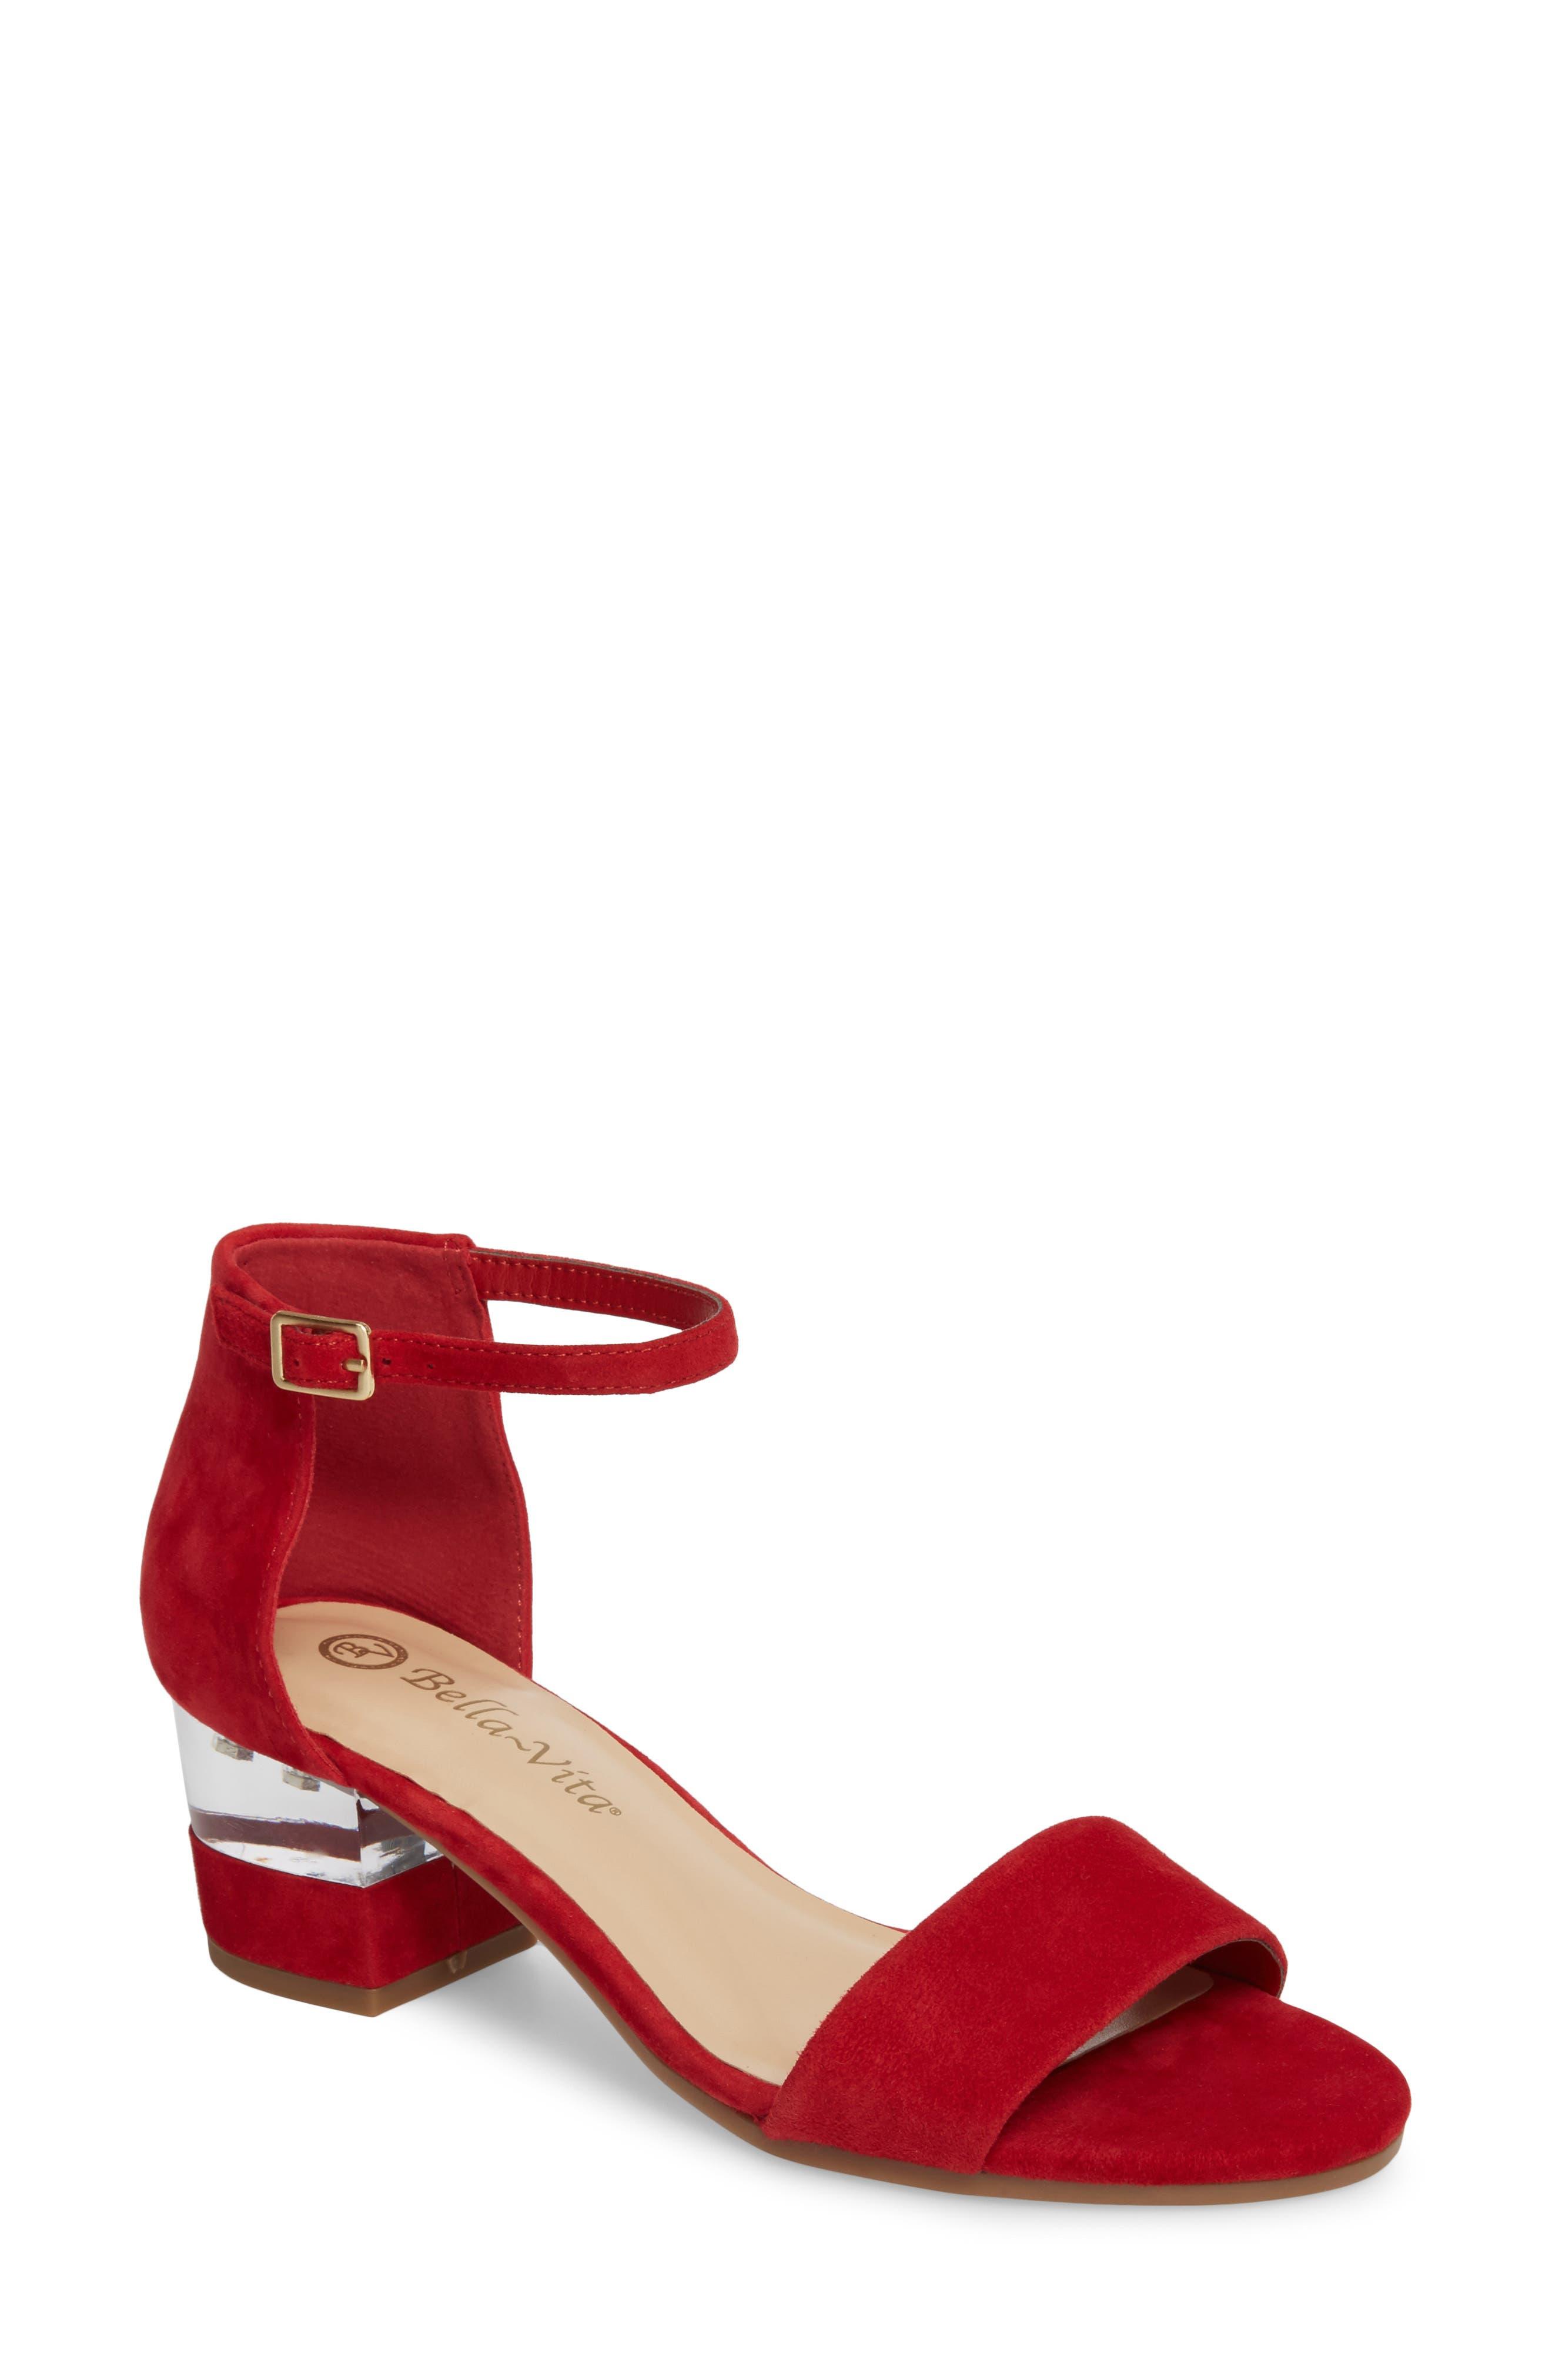 Fitz Block Heel Sandal,                         Main,                         color, Red Suede